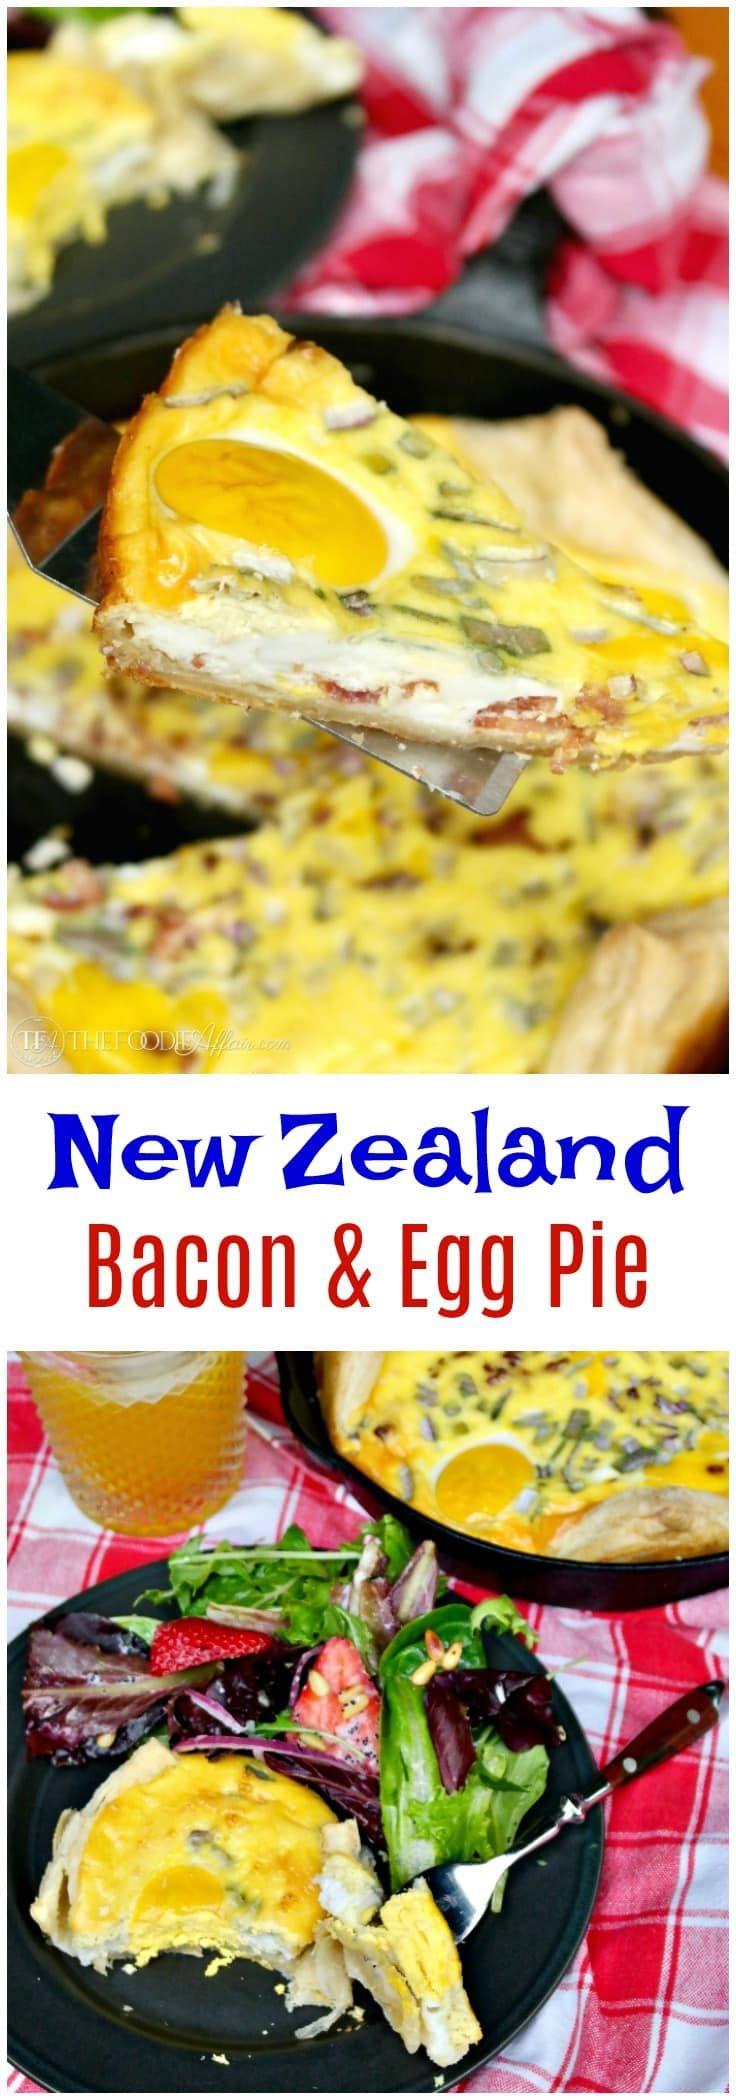 New Zealand Bacon And Egg Pie Easy Open Face Style Recipe Egg Pie Breakfast Recipes Easy Breakfast Brunch Recipes